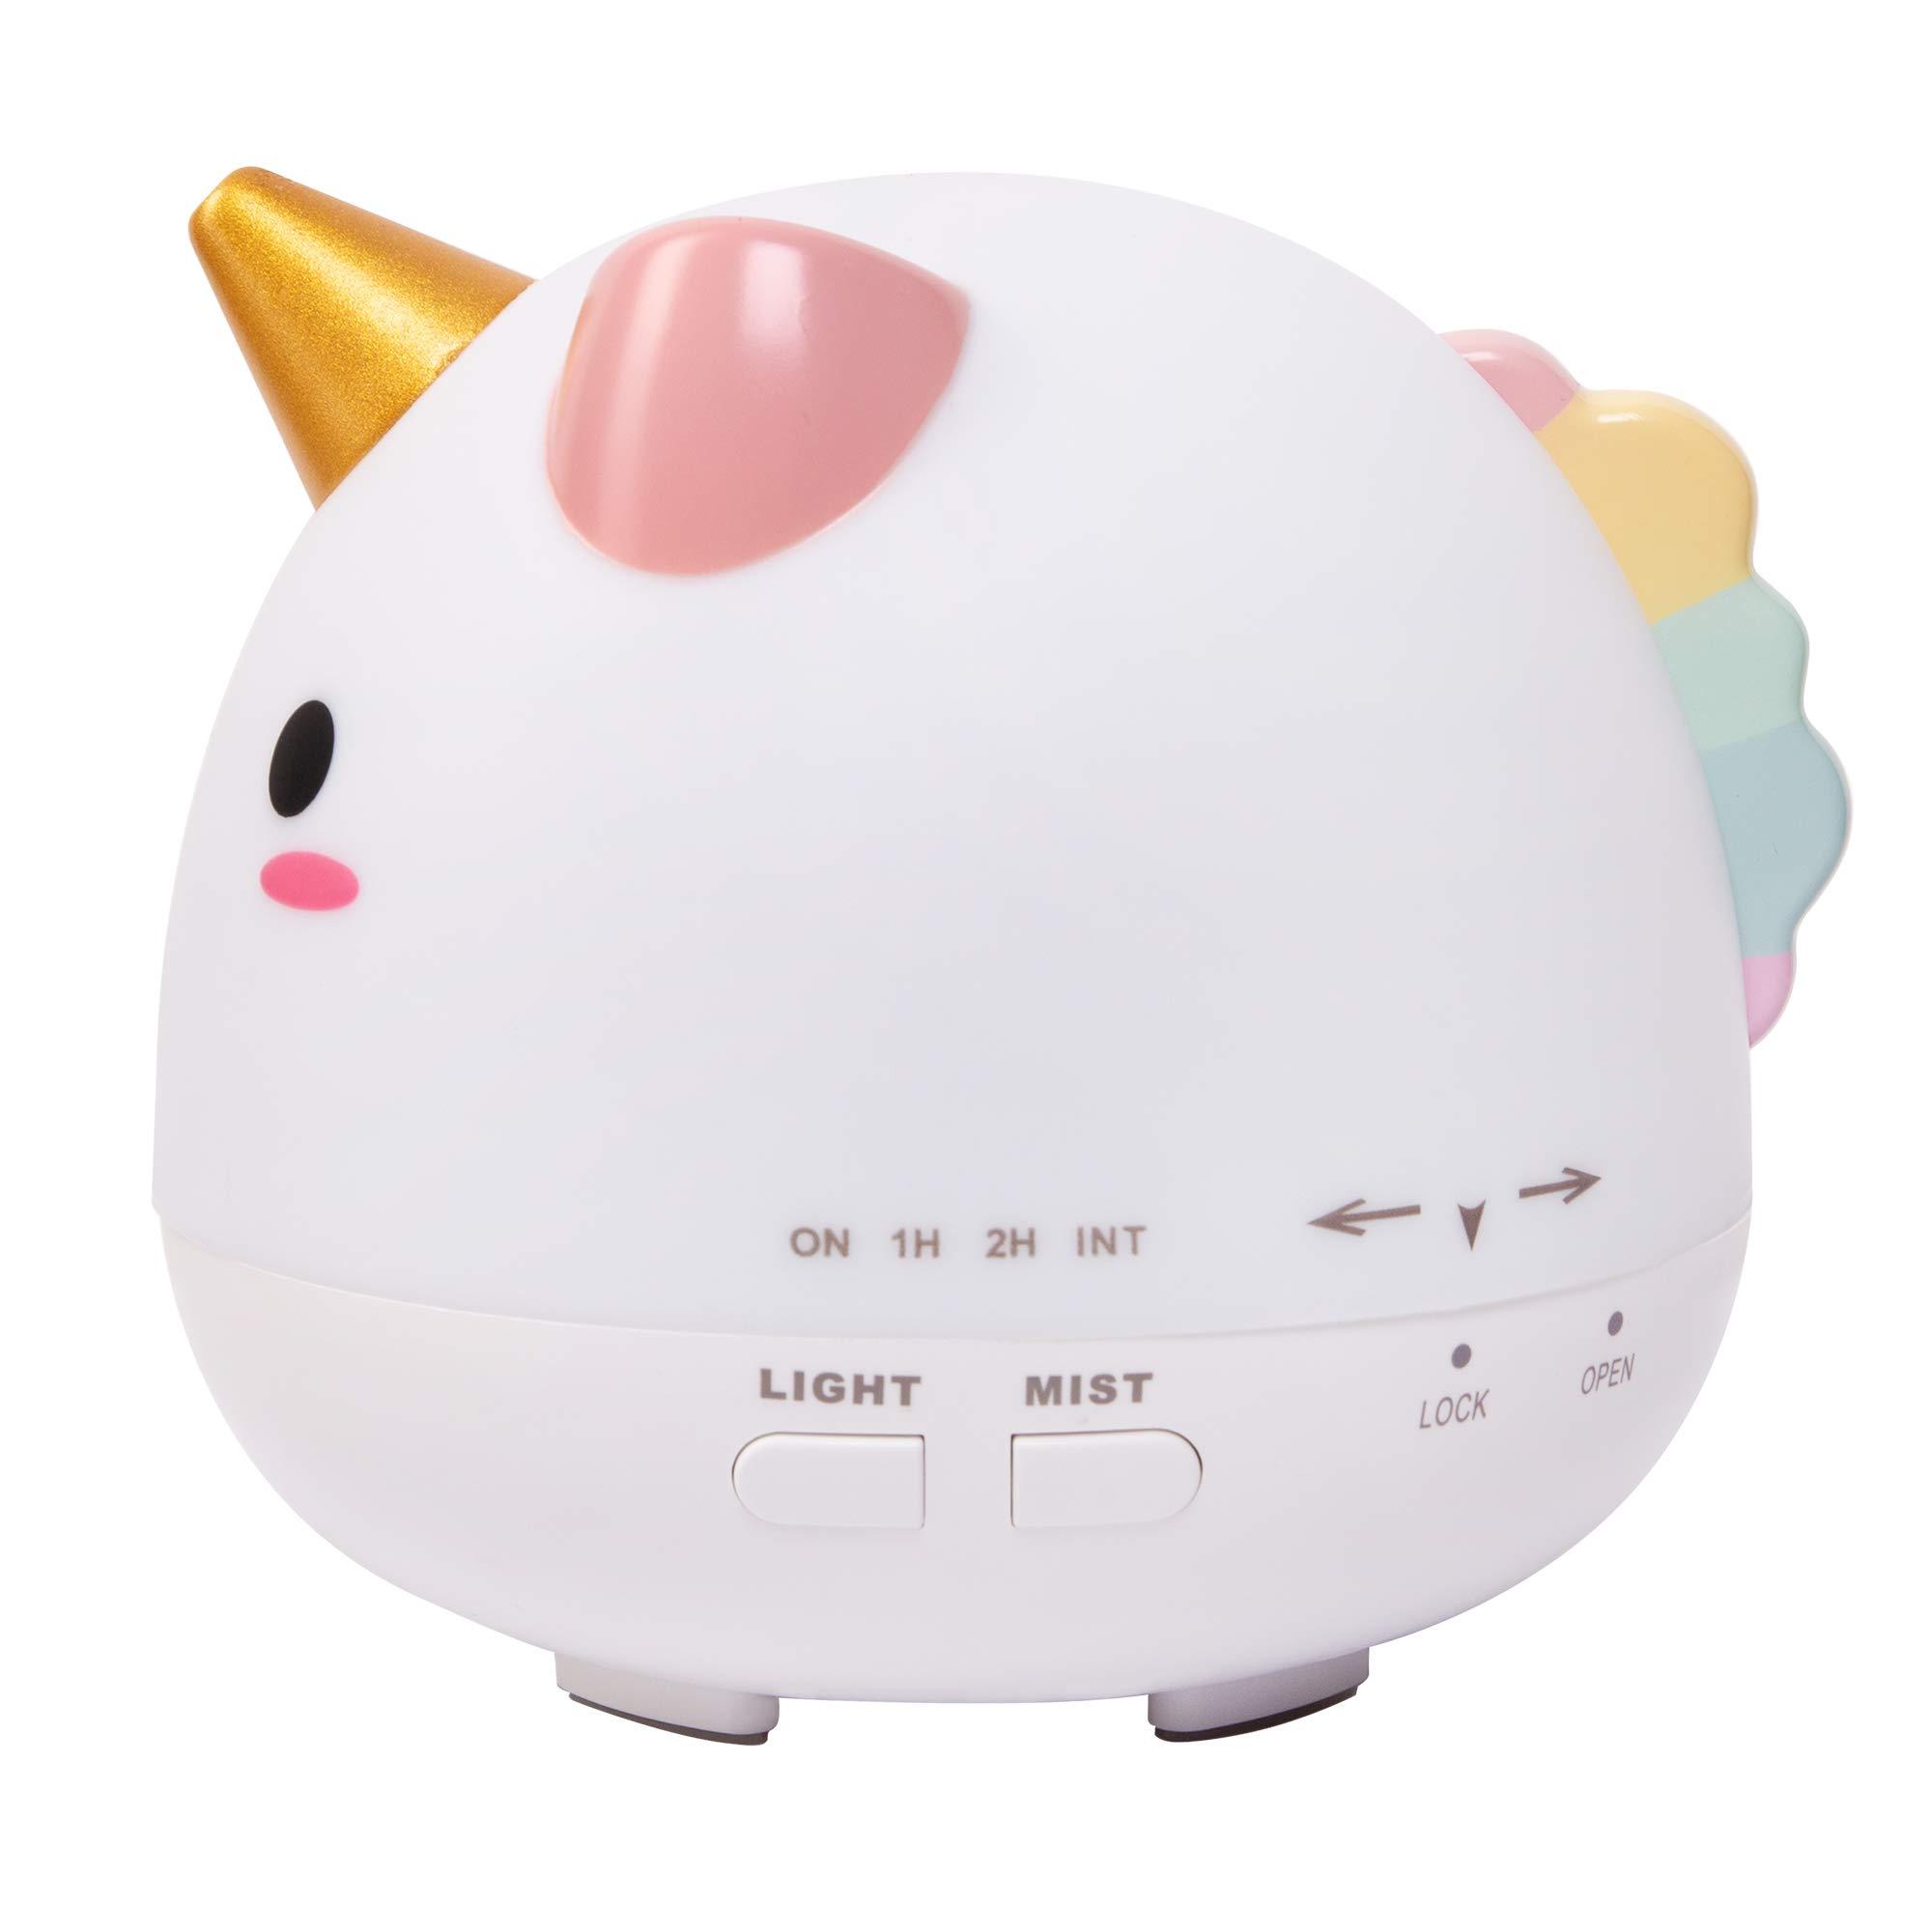 Smoko 200ml Elodie Unicorn Diffuser Ultrasonic